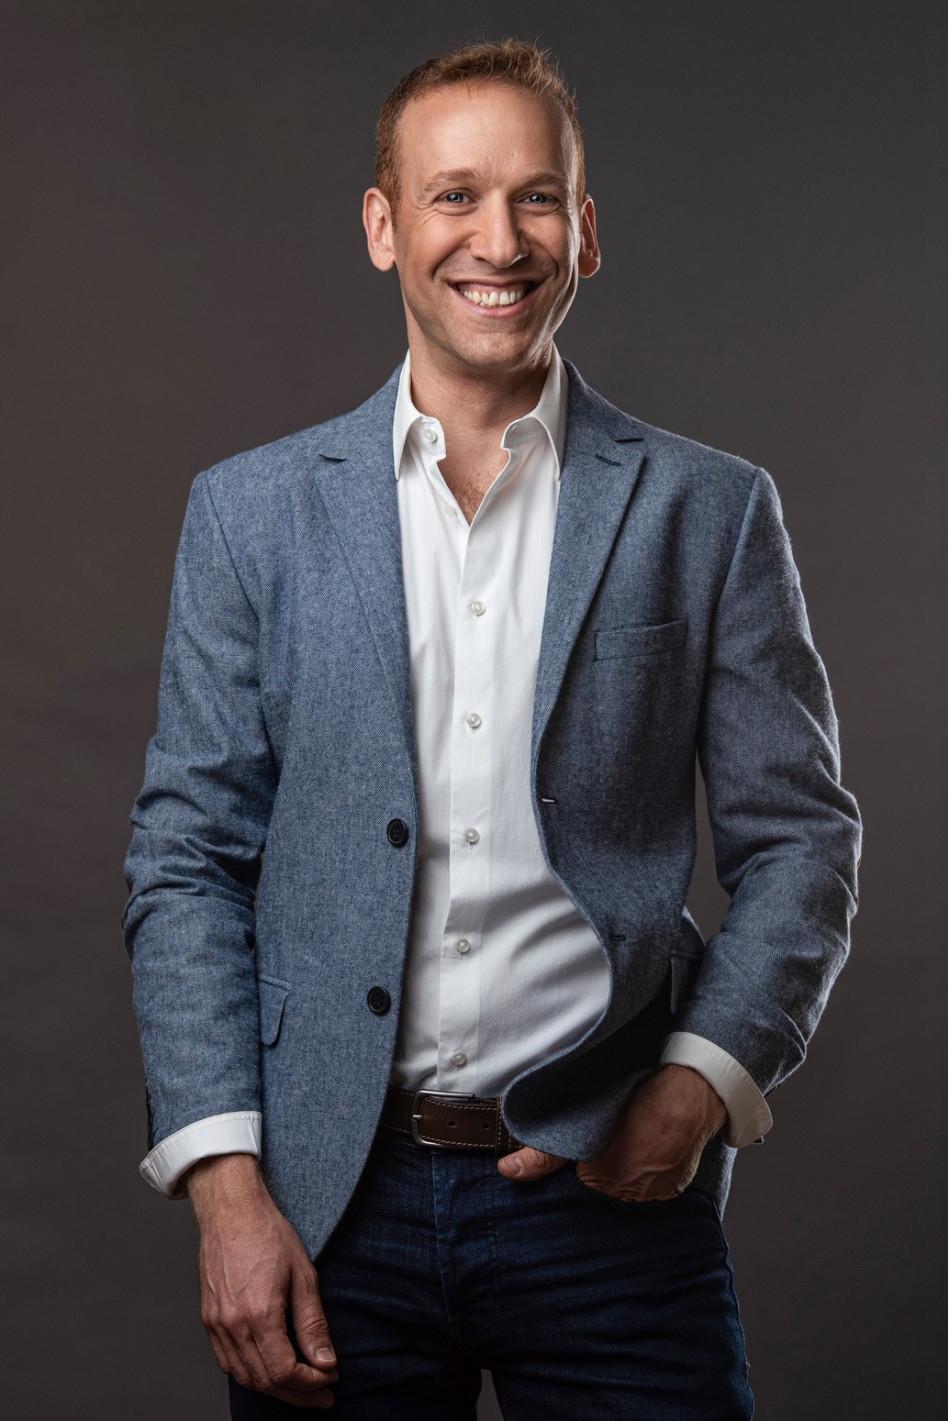 אריאל פורת (צילום: אלכס קלימוביץ')